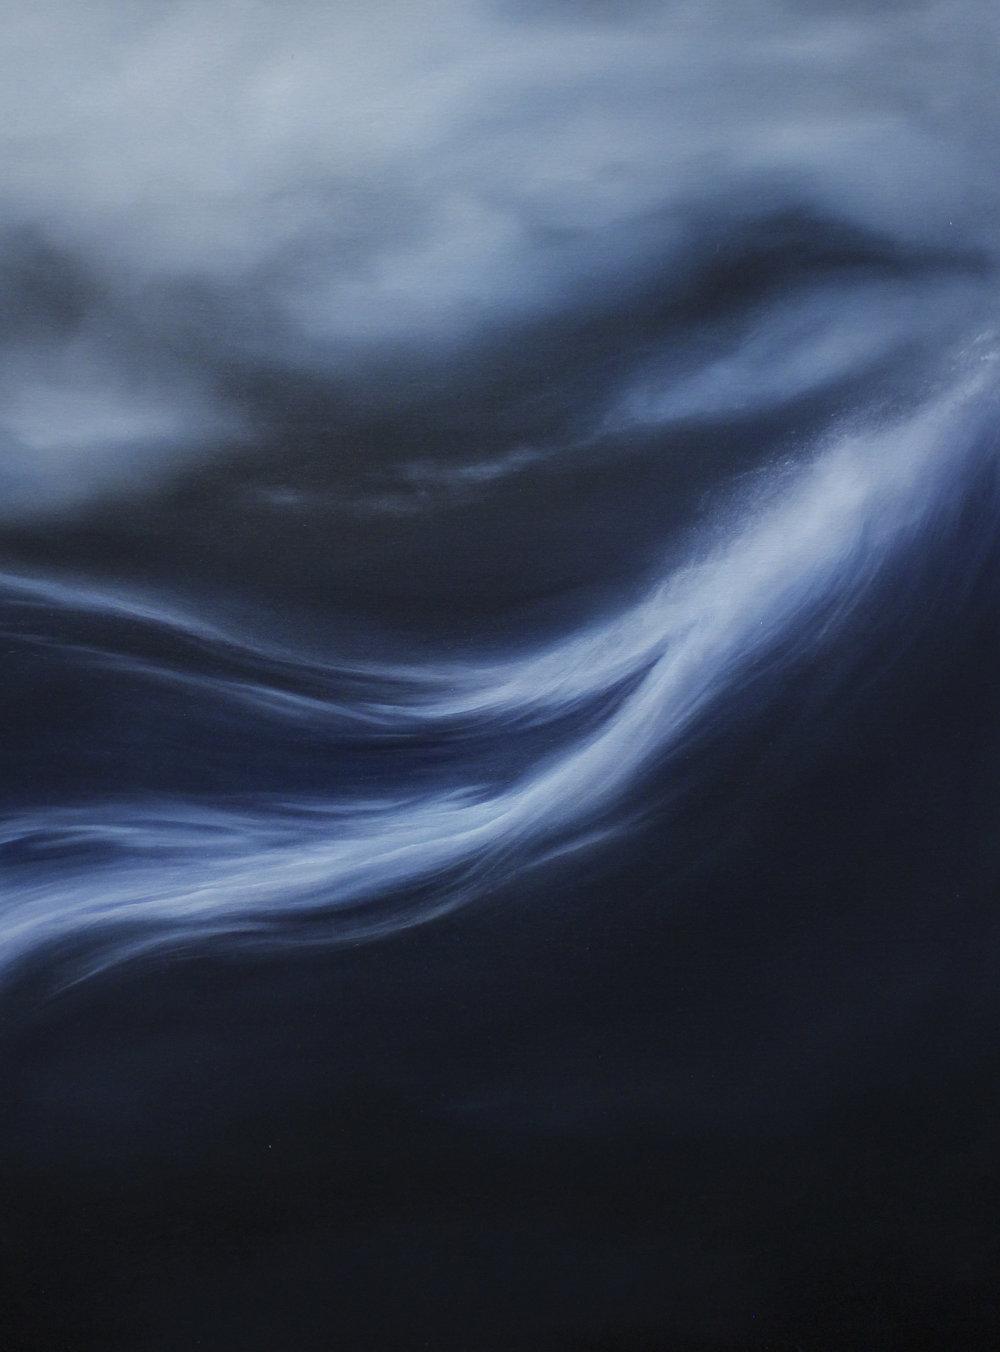 Undulation+III.+2015_+101x76cm_+Oil+on+Canvas.jpg